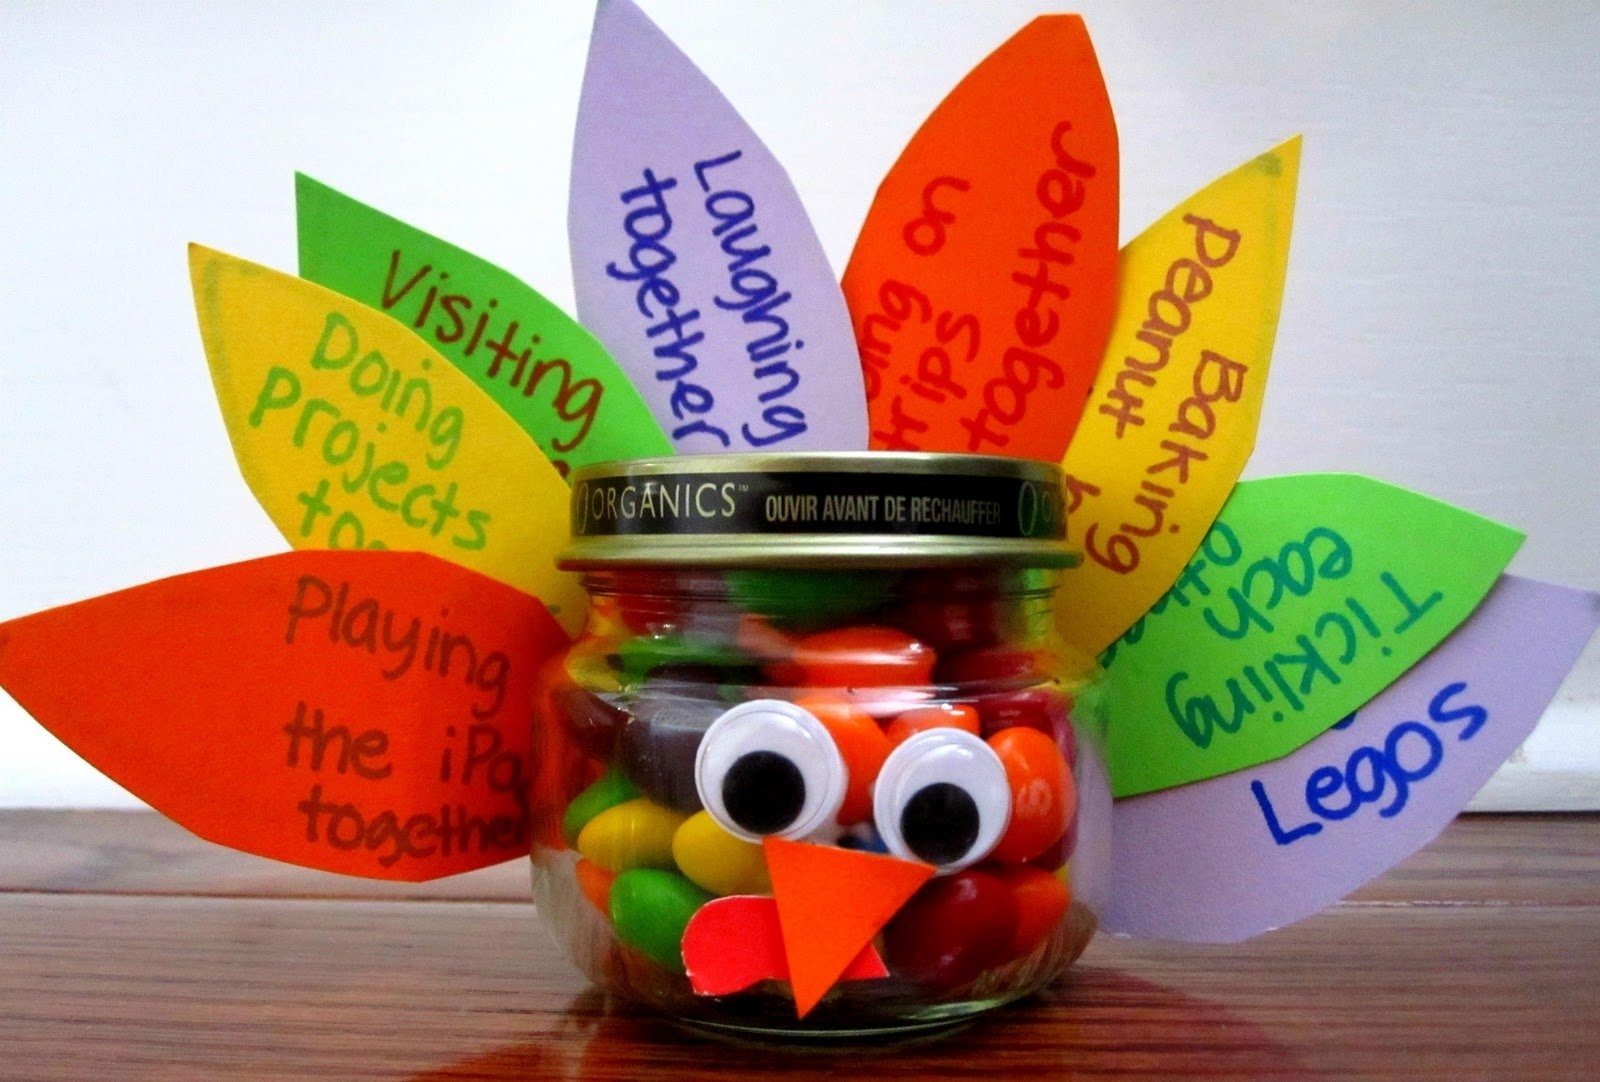 10 Best Thanksgiving Craft Ideas For Preschoolers fun easy turkey crafts kids make babycenter blog dma homes 9393 1 2020